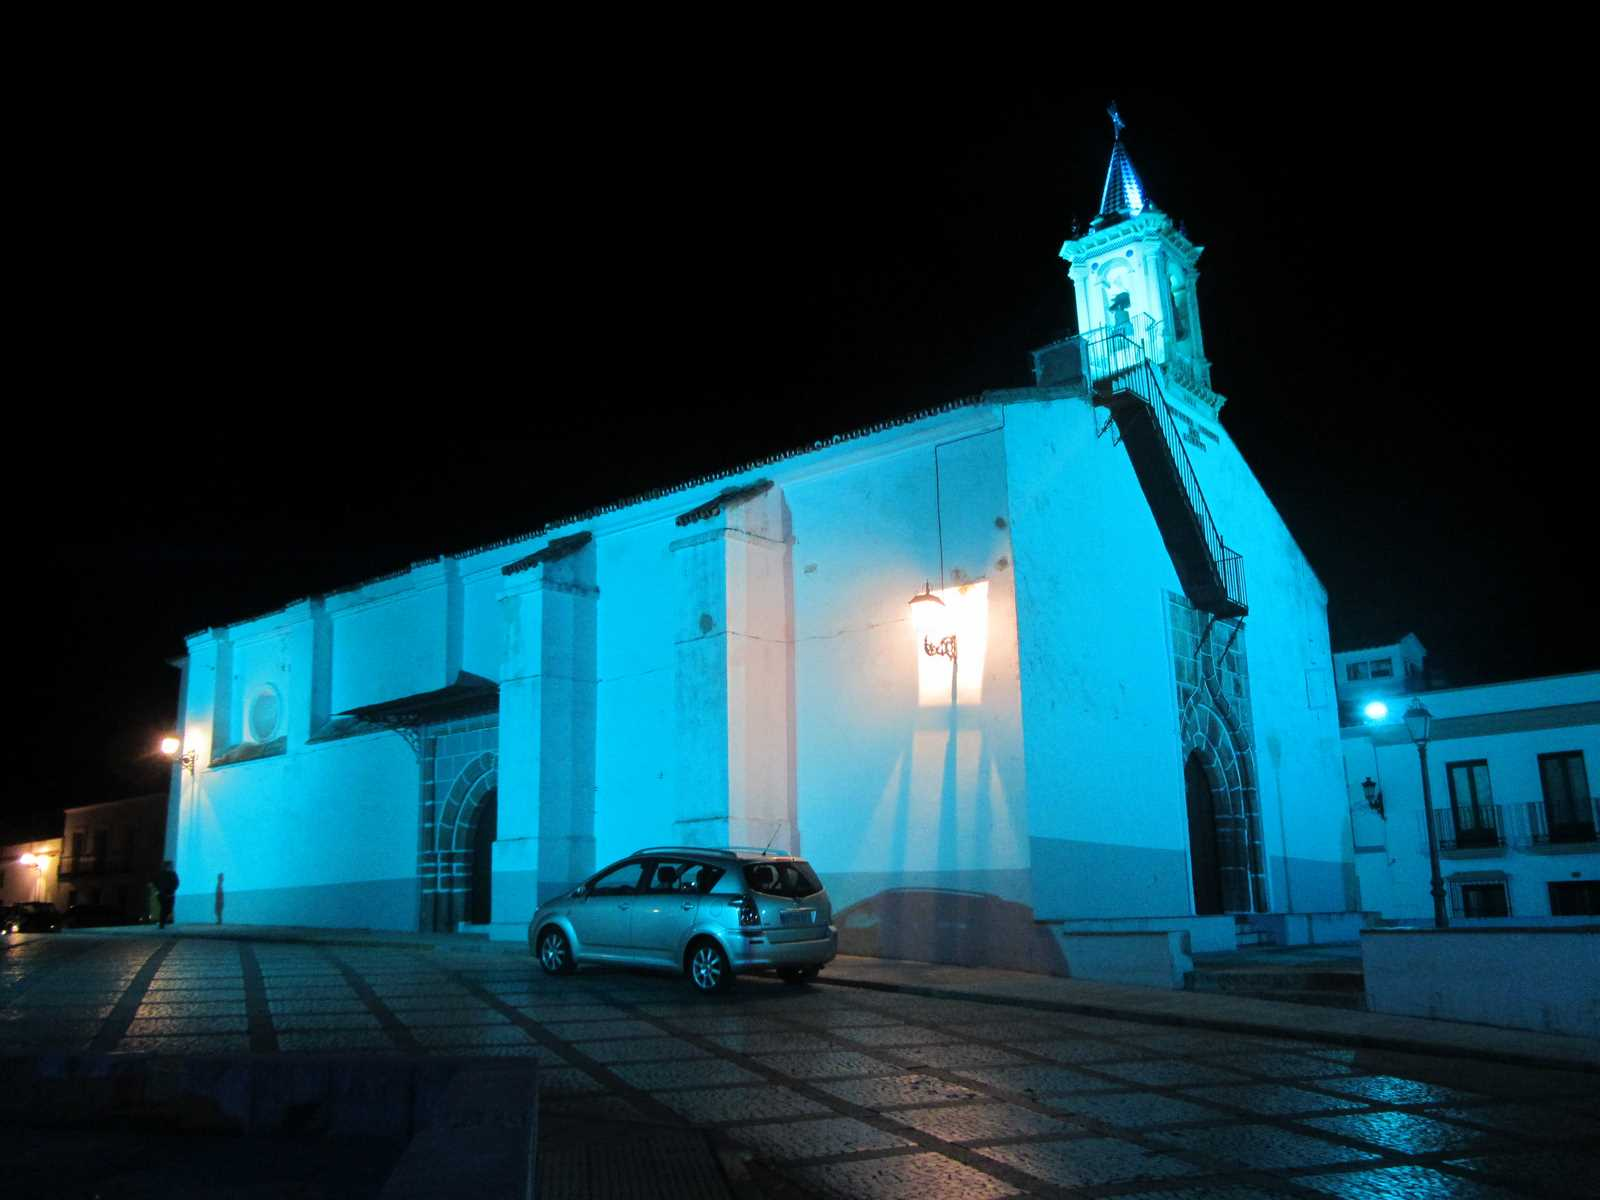 Plaza del Loreto, Higuera la Real (Badajoz)